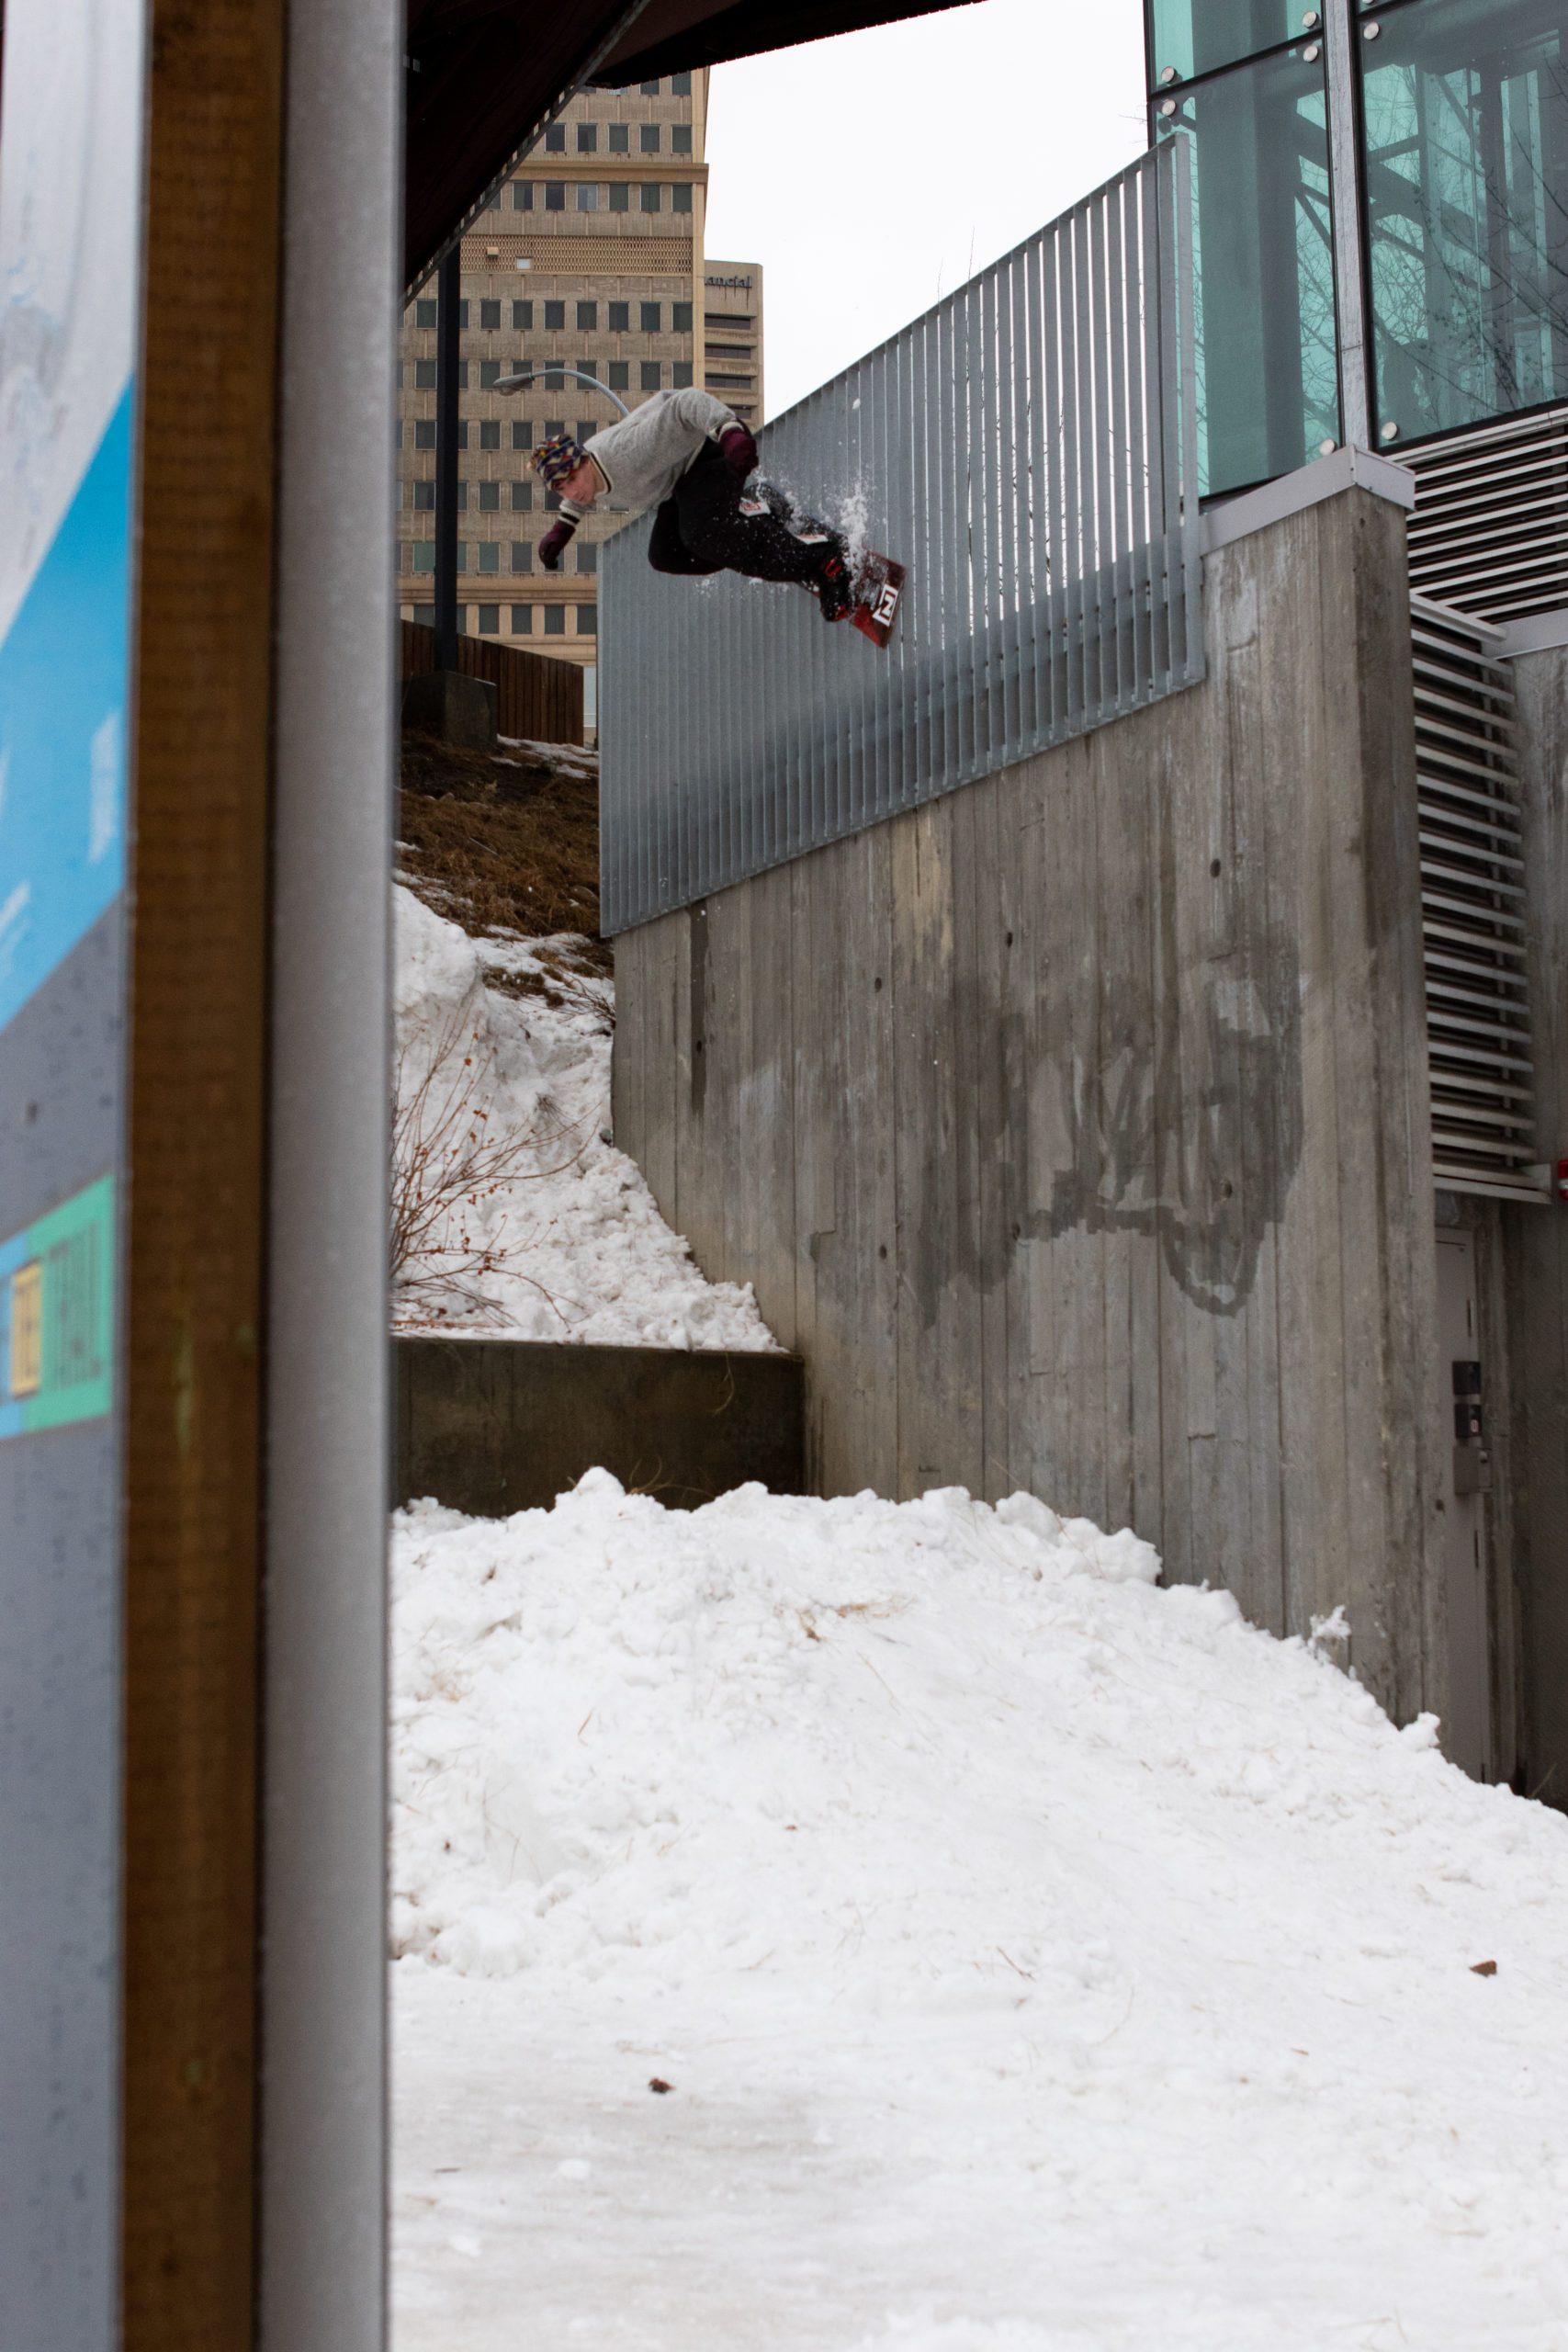 SRD Simulation snowboarding Full Movie